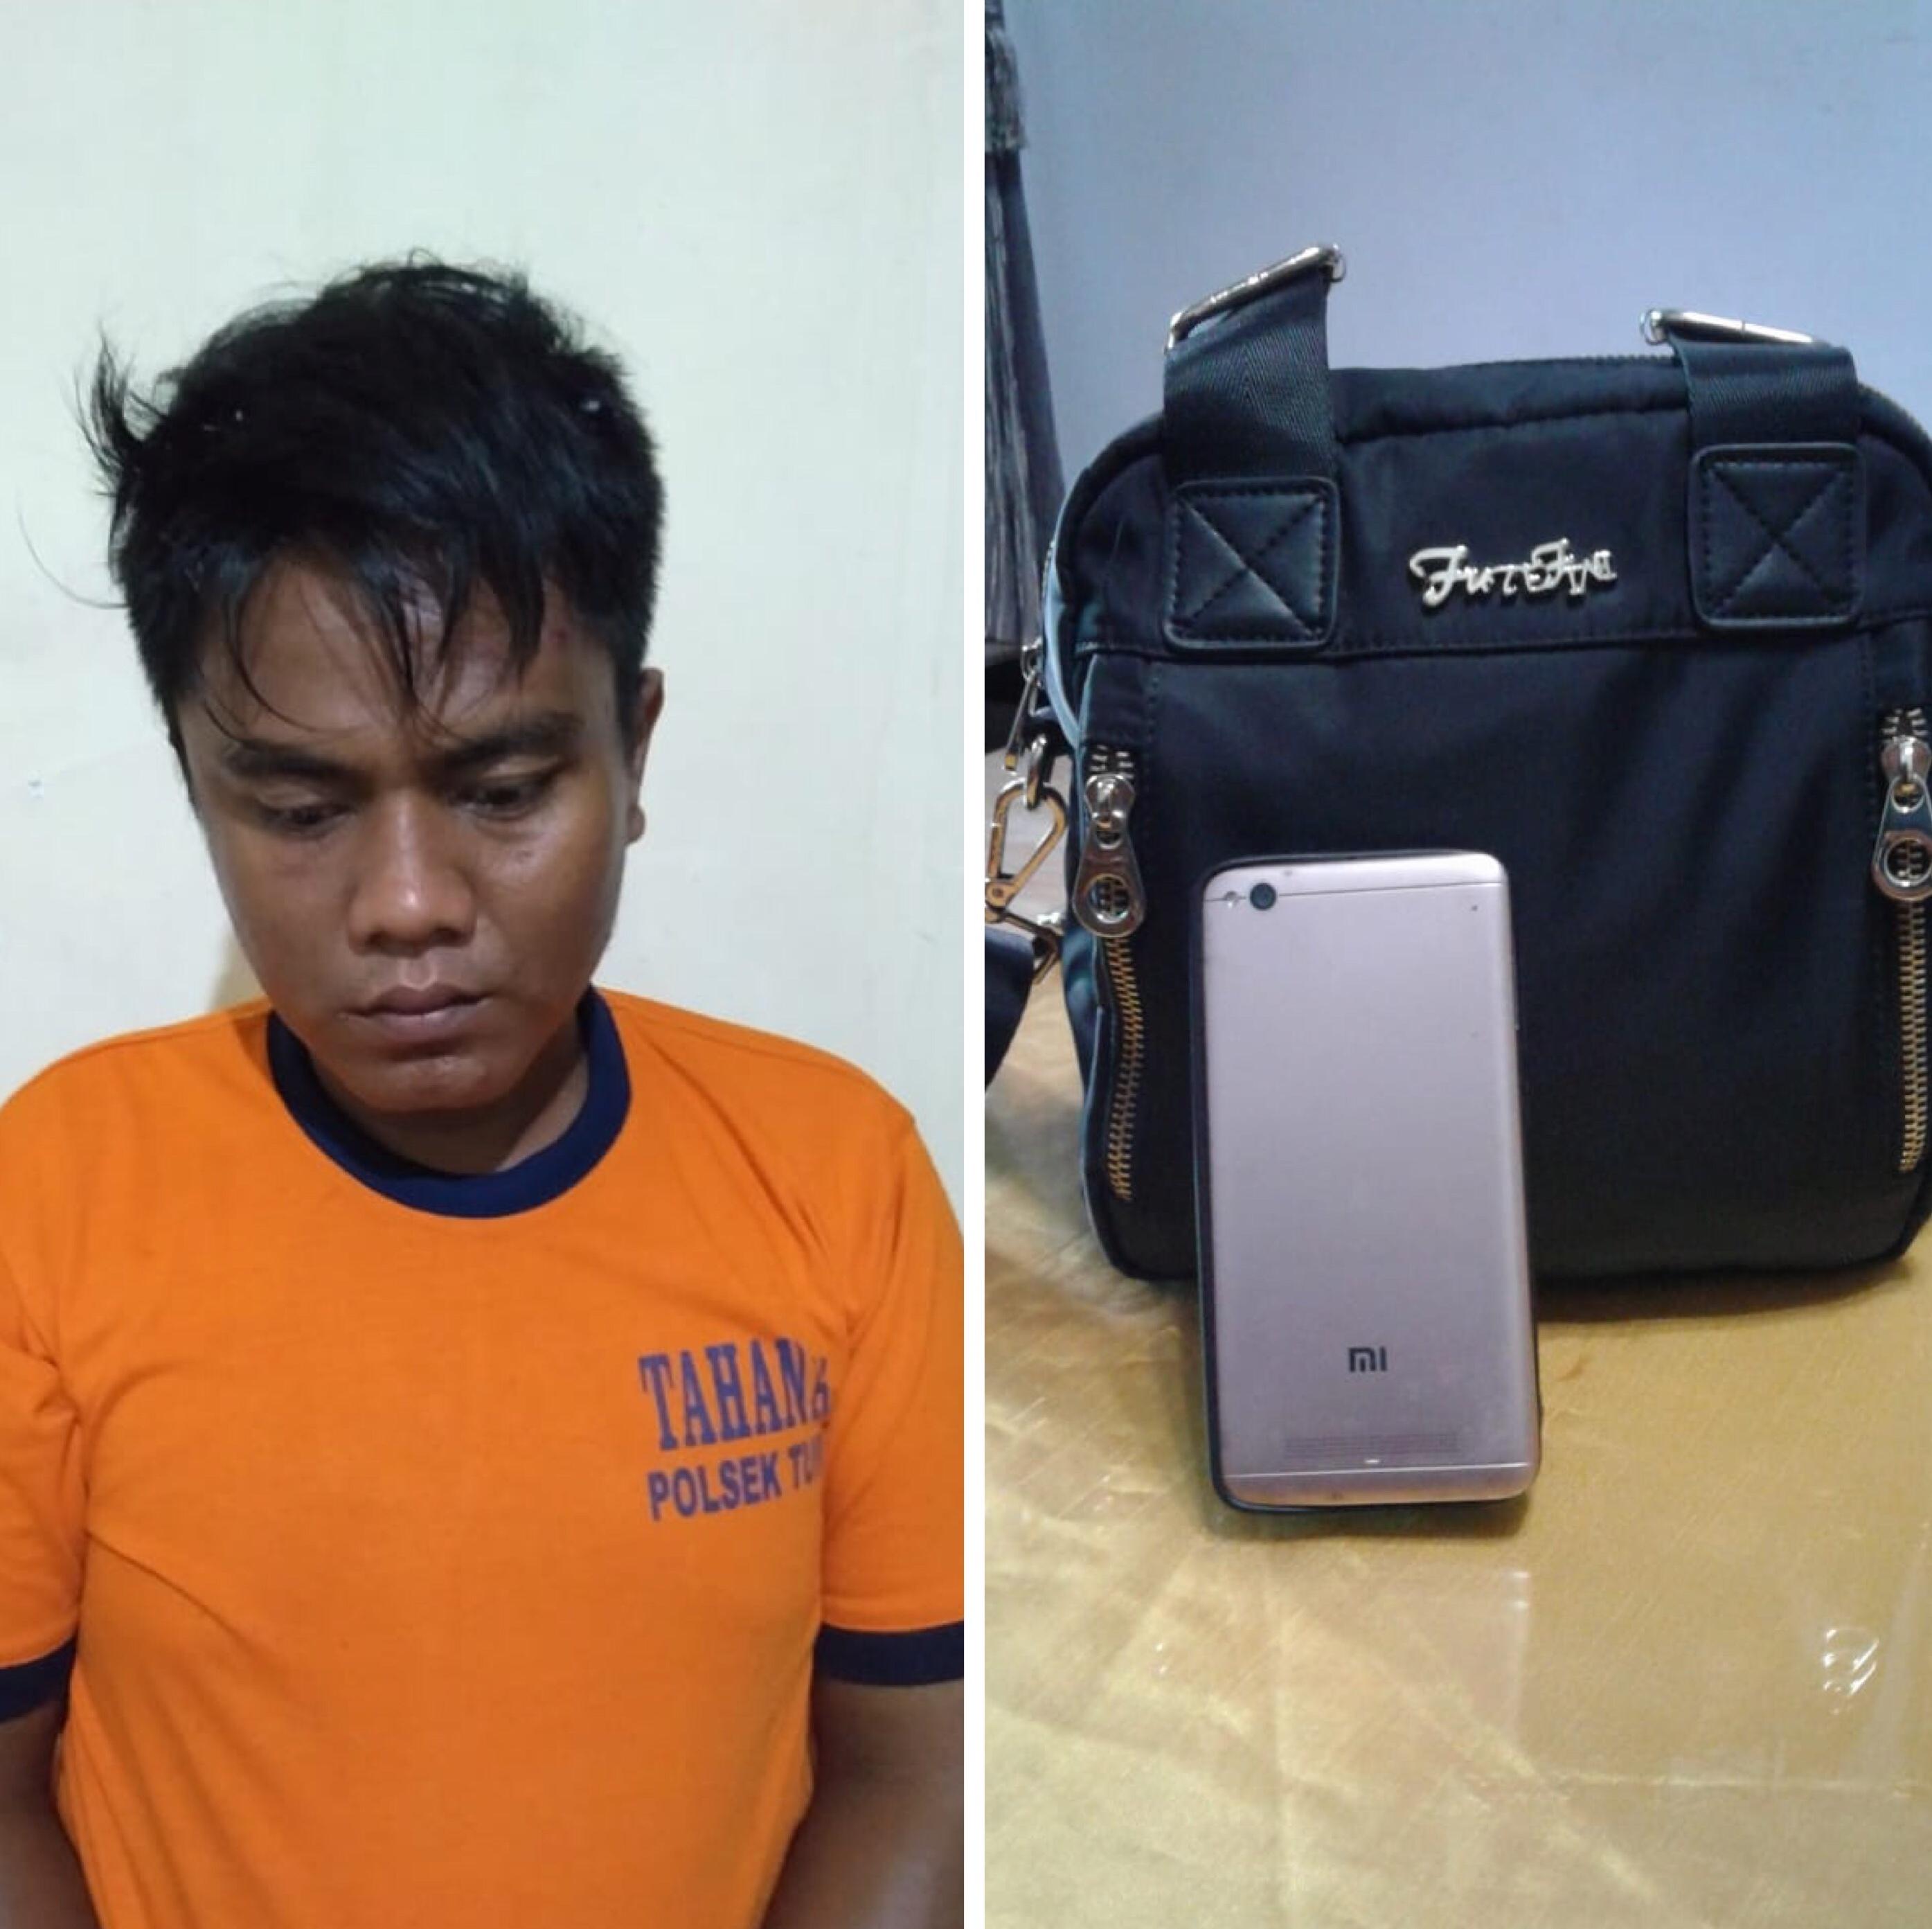 Mohammad Hasanudin tersangka beserta barang bukti hasil curian saat diamankan polisi, Kecamatan Turen (Foto : Polsek Turen for MalangTIMES)